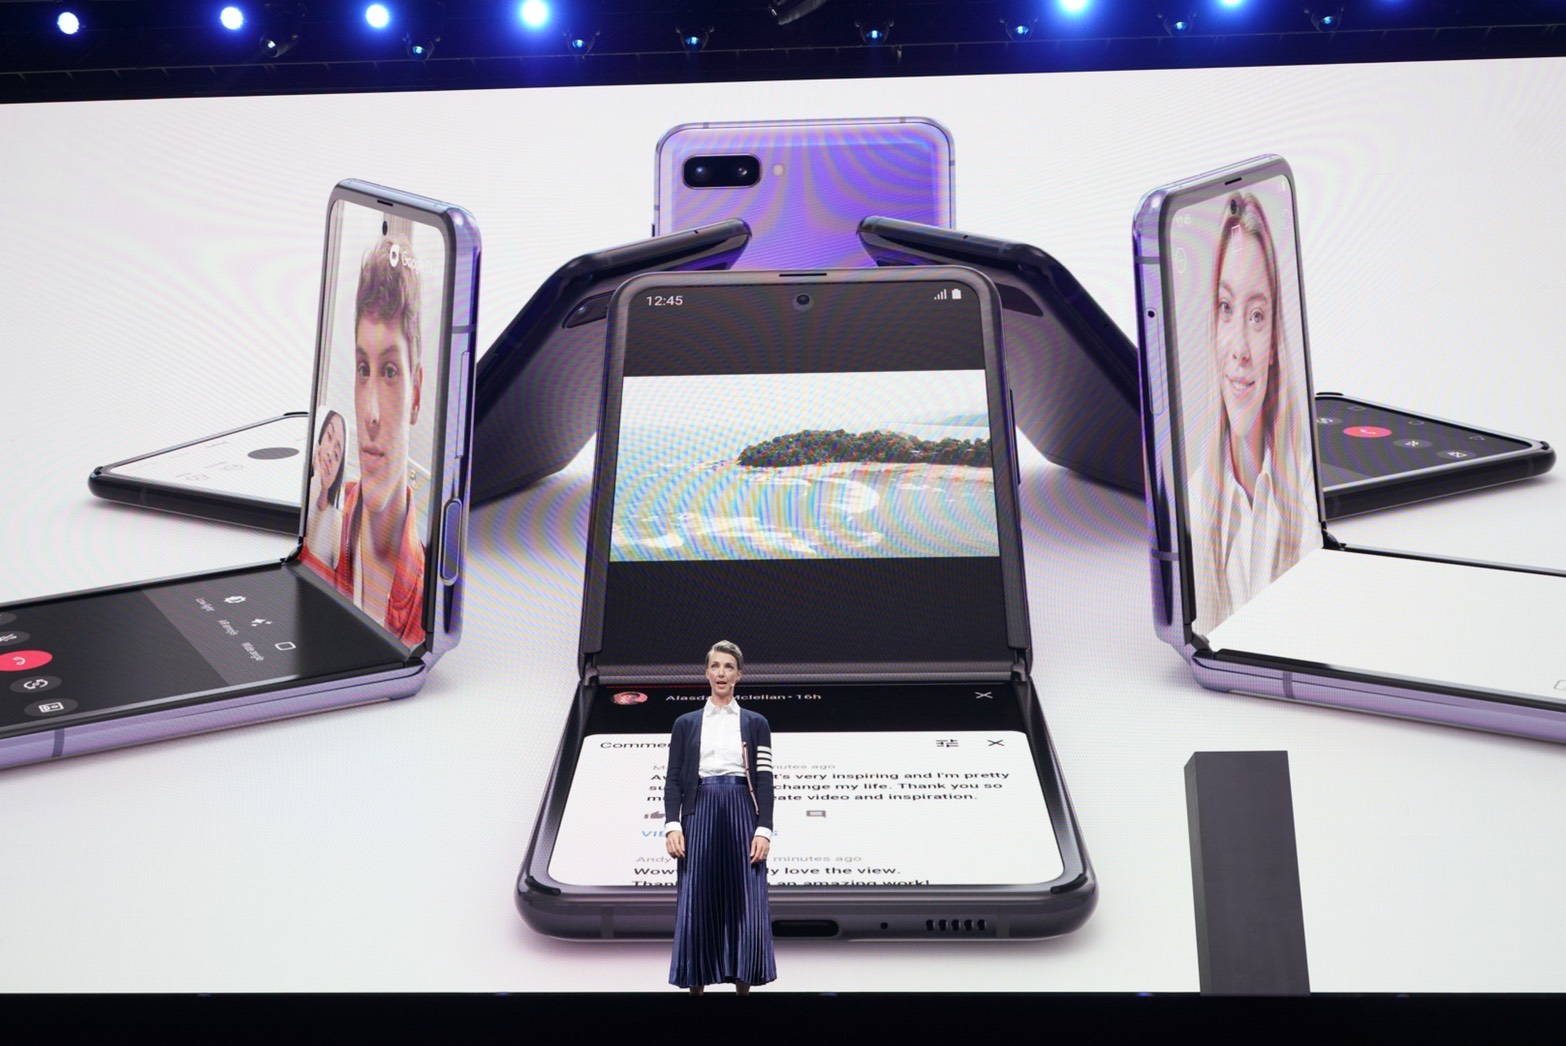 Samsung Galaxy Z Flip  掌中摺疊機,售價 1,380 美元、2/14 陸續上市